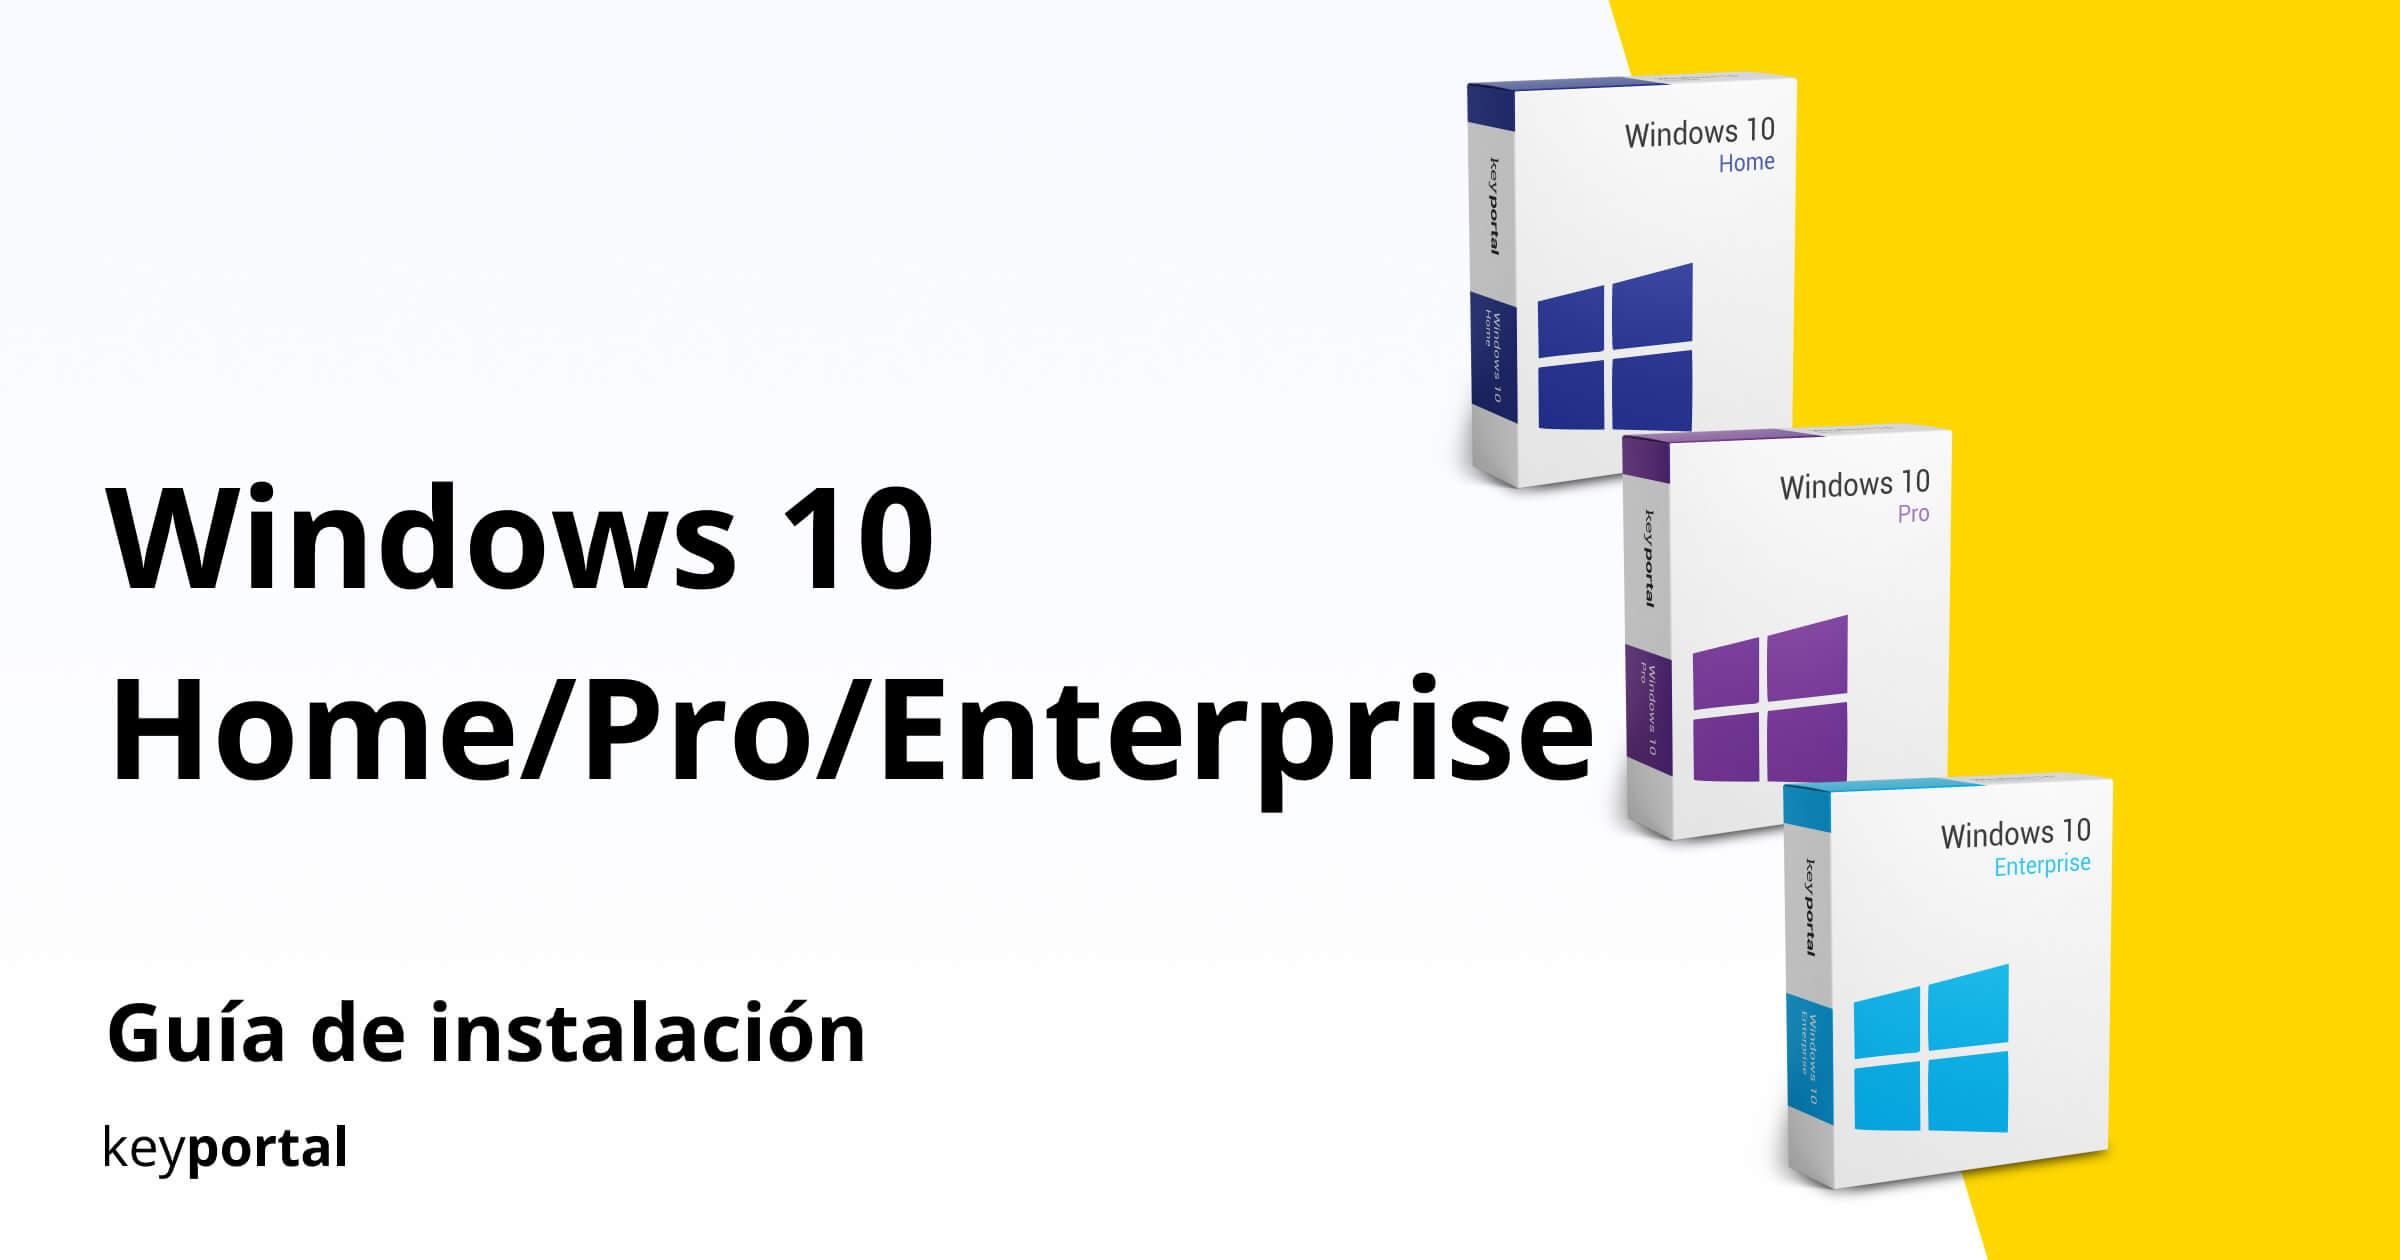 10 aktivierung windows umgehen key Remove Office365